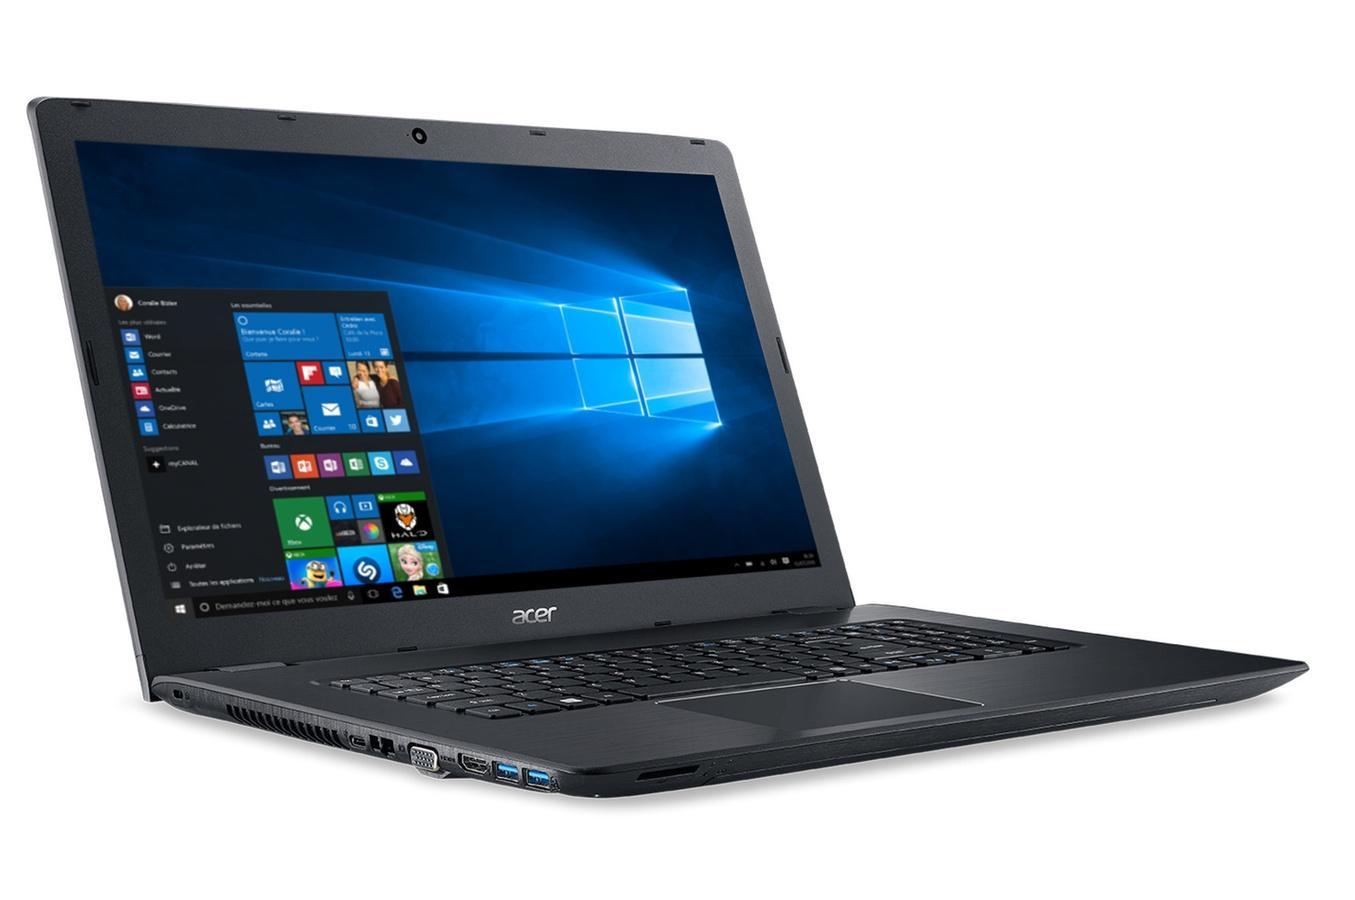 "PC portable 17.3"" Acer Aspire E5-774G-54R5 (i5-6200U, GTX 950M, 4 Go de RAm, 1 To)"